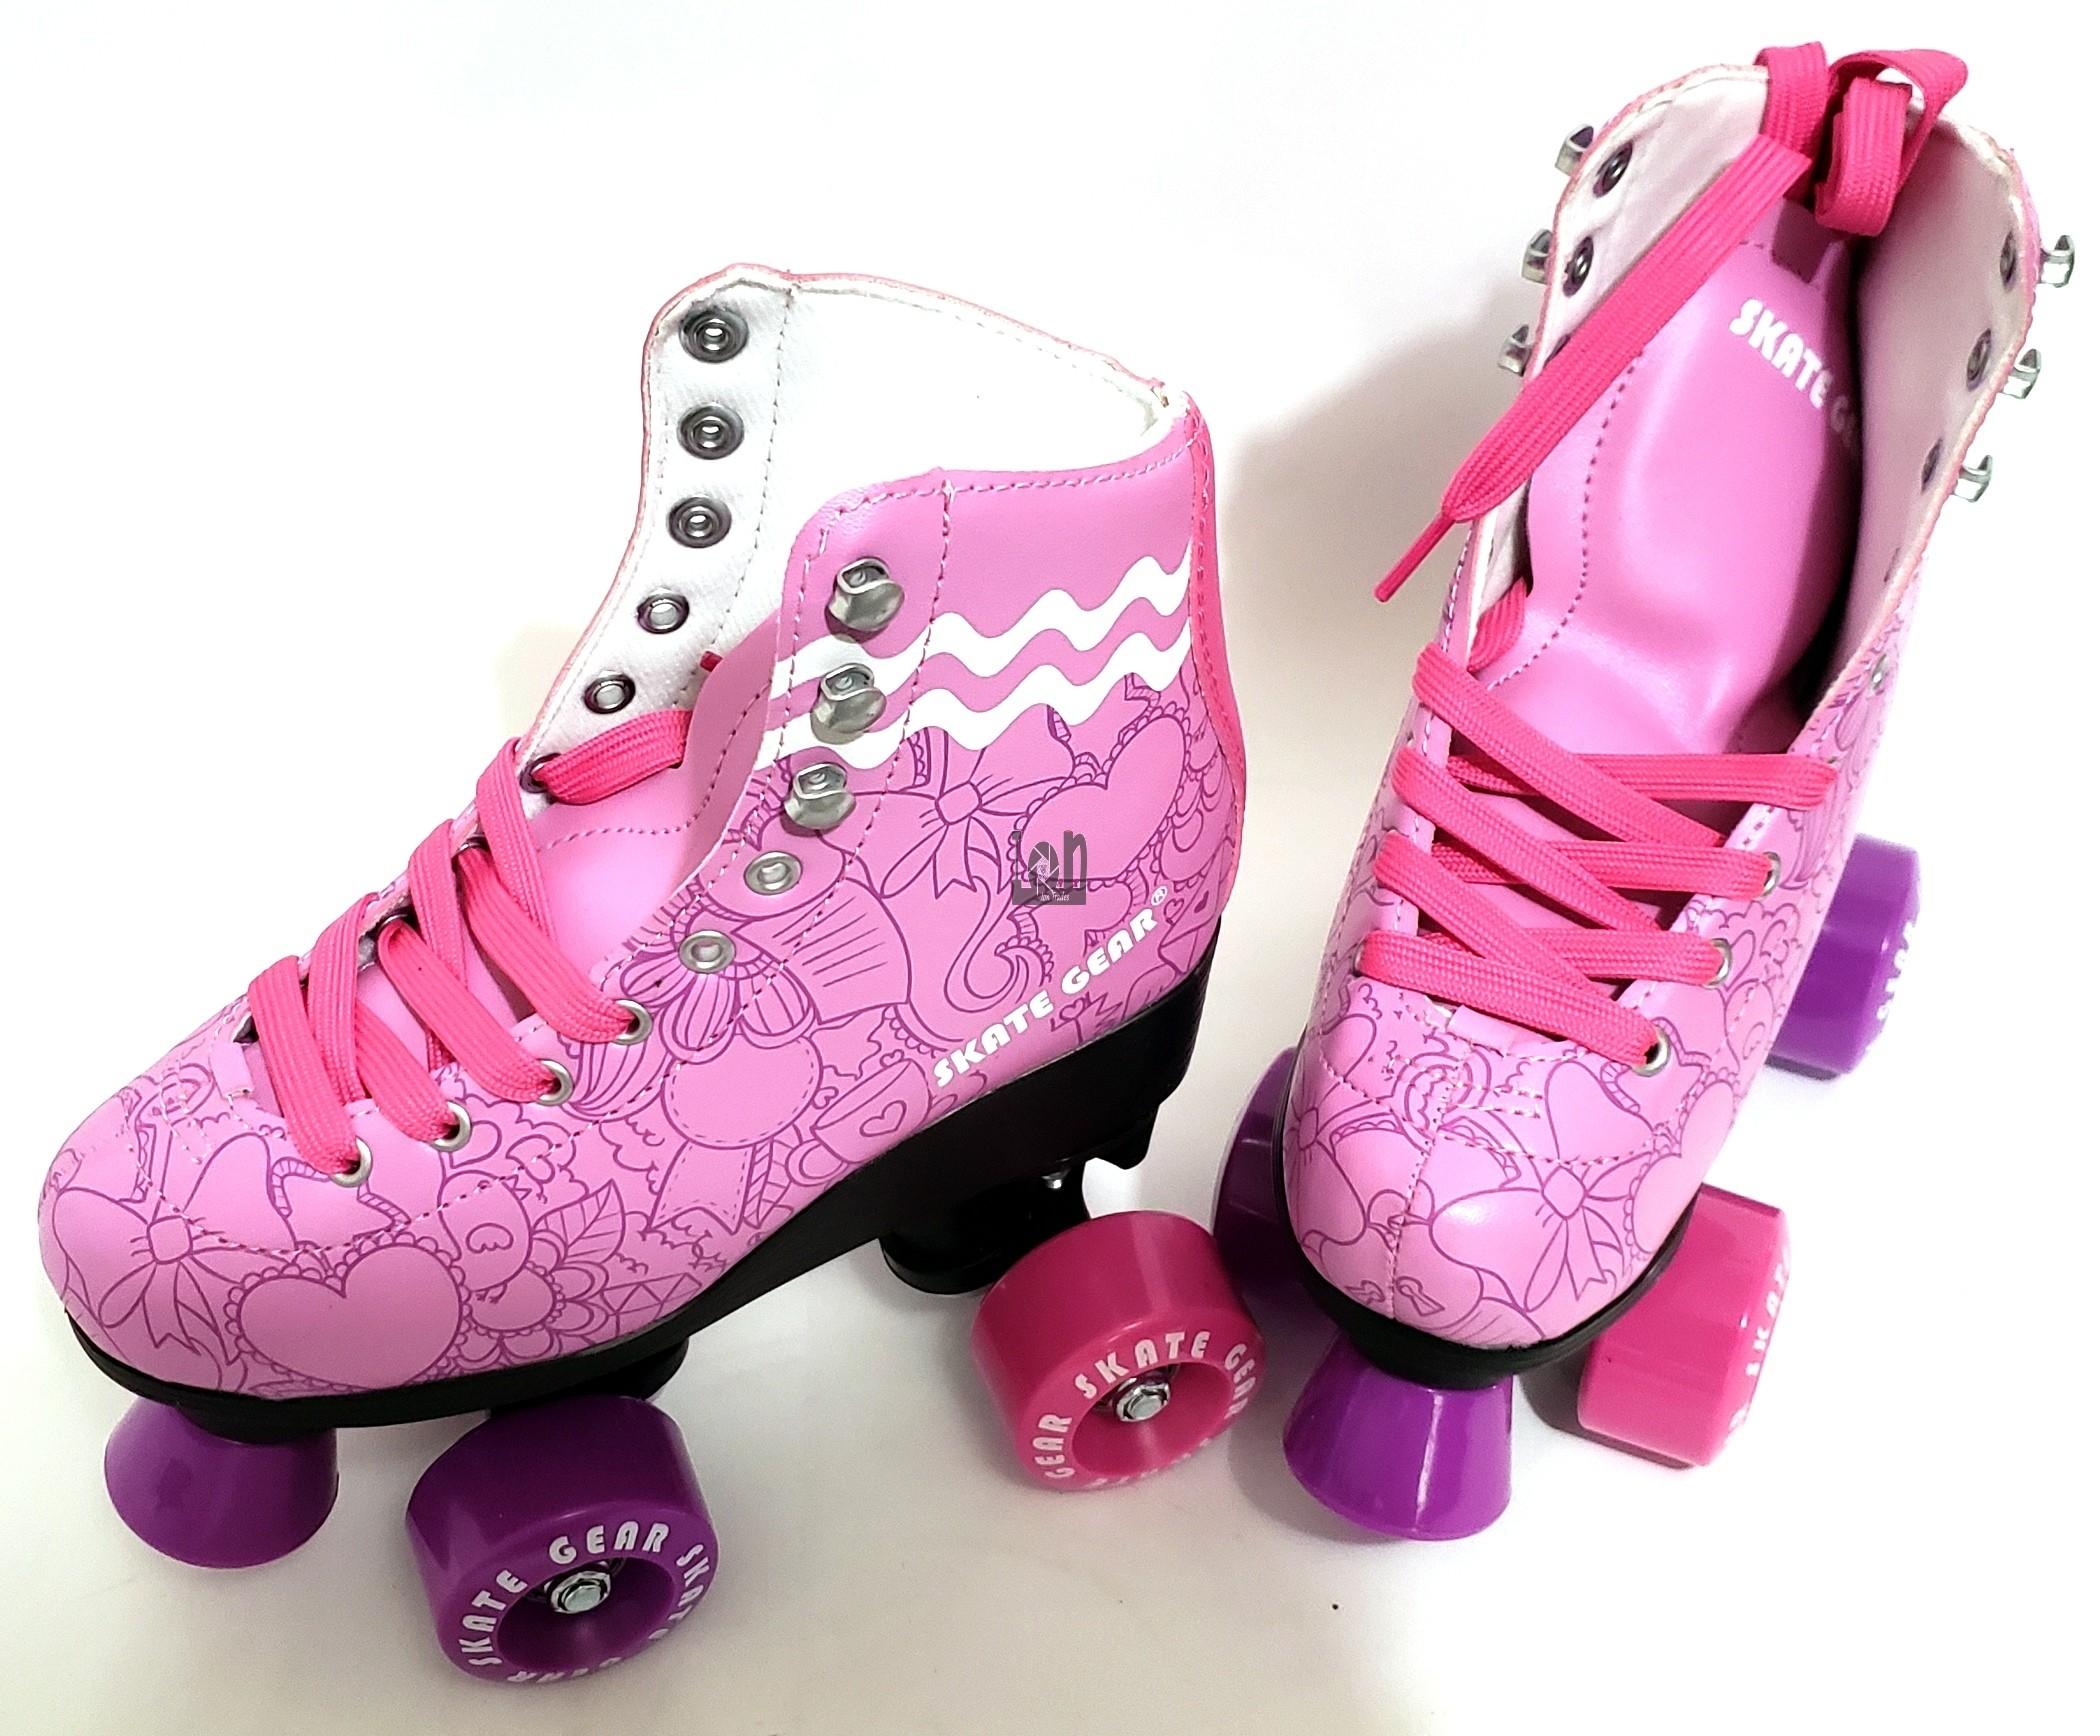 Skate Gear Purple Roller Skates Leather PK Size 2 US